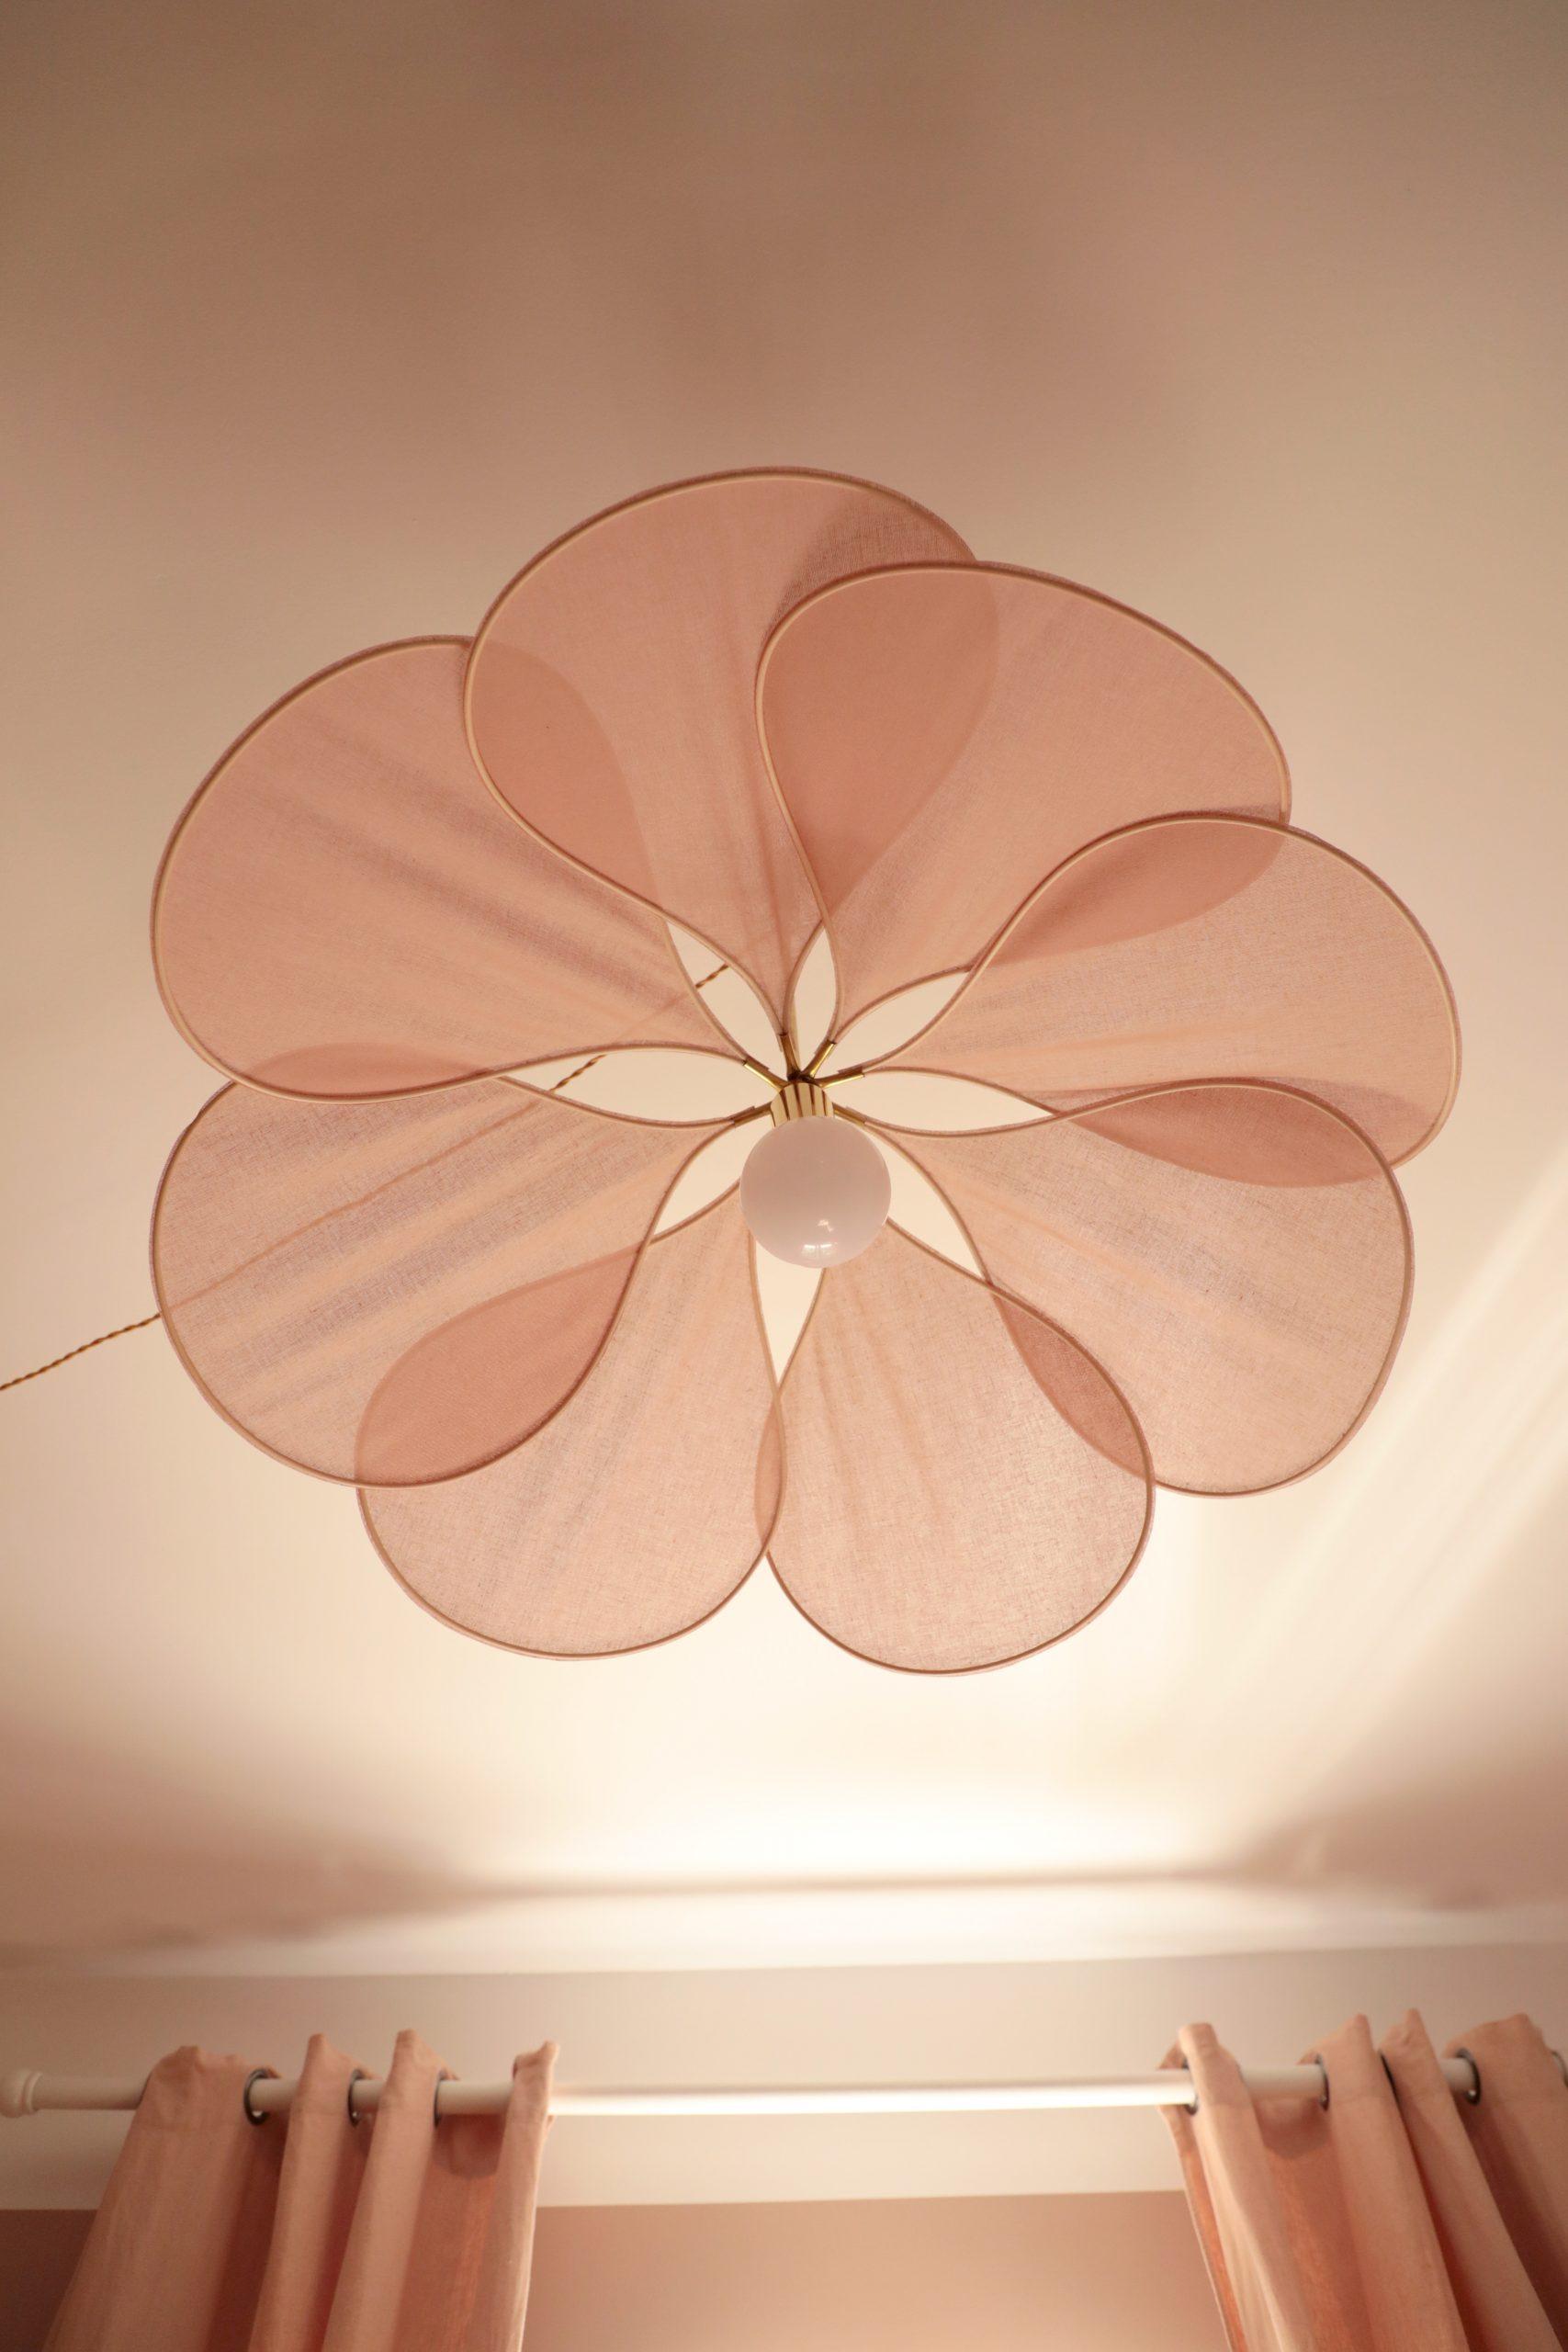 décoration chambre fille suspension pales rose Georges store